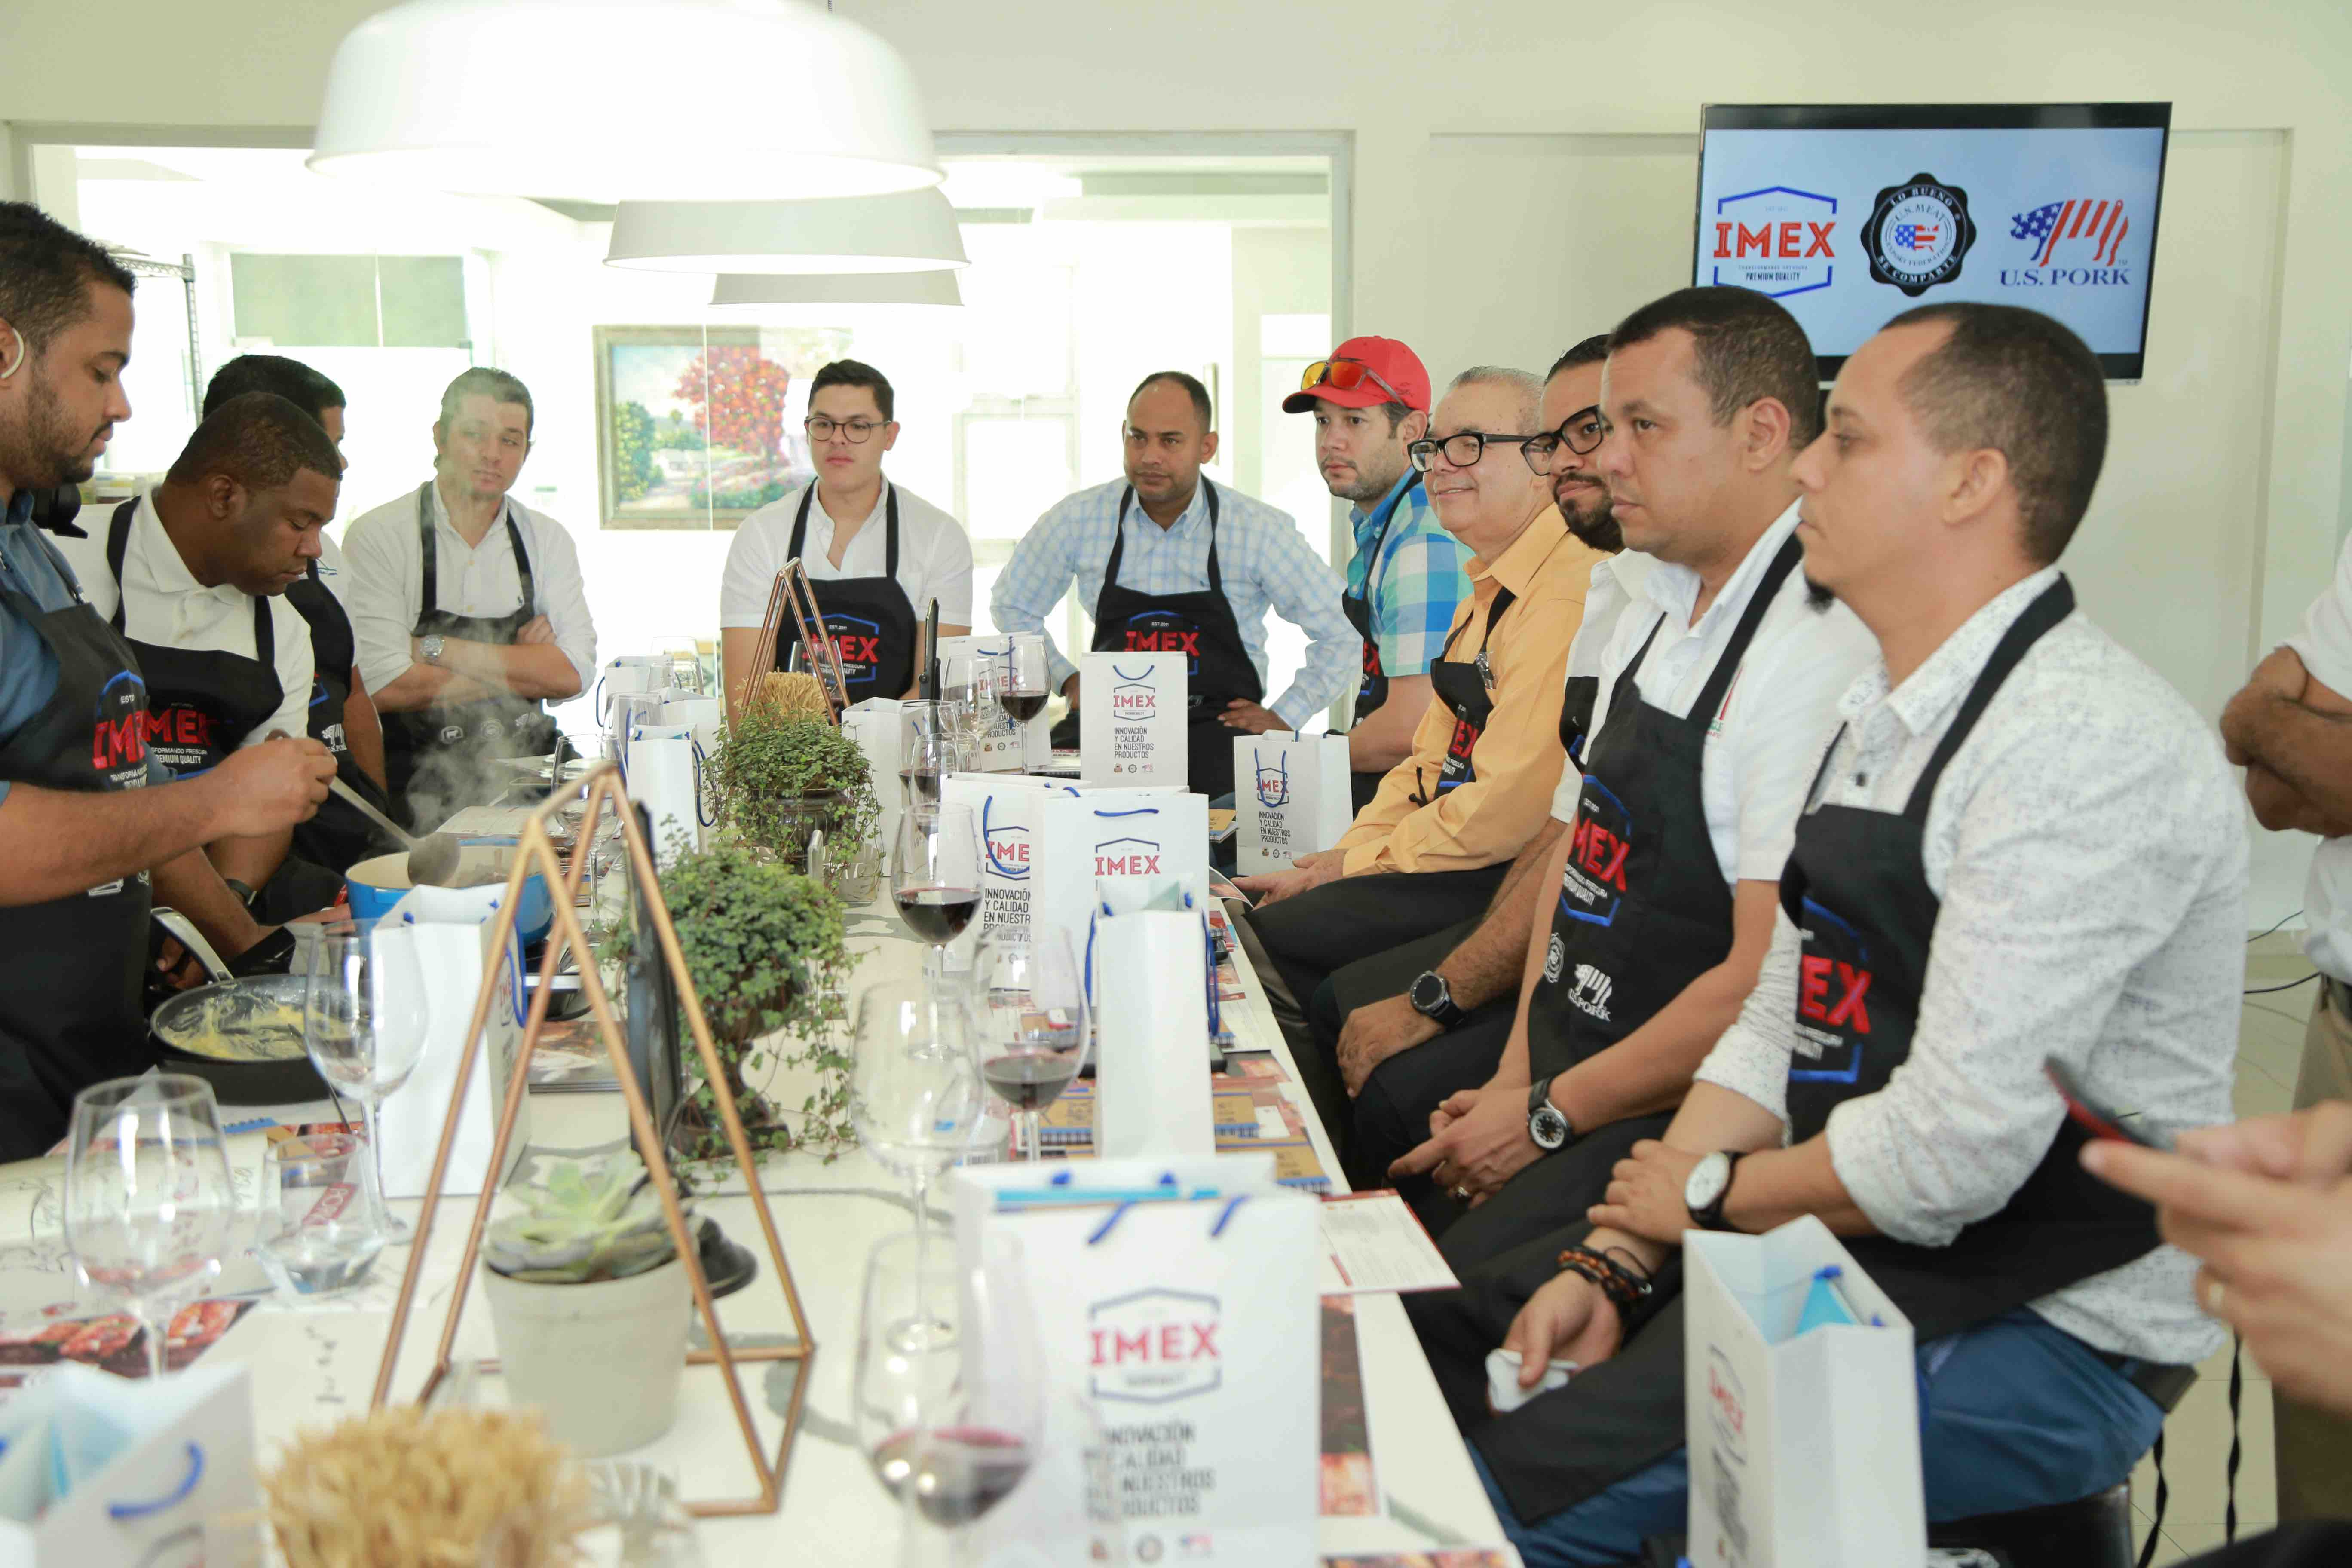 6. Invitados aprendiendo junto al chef Raymond